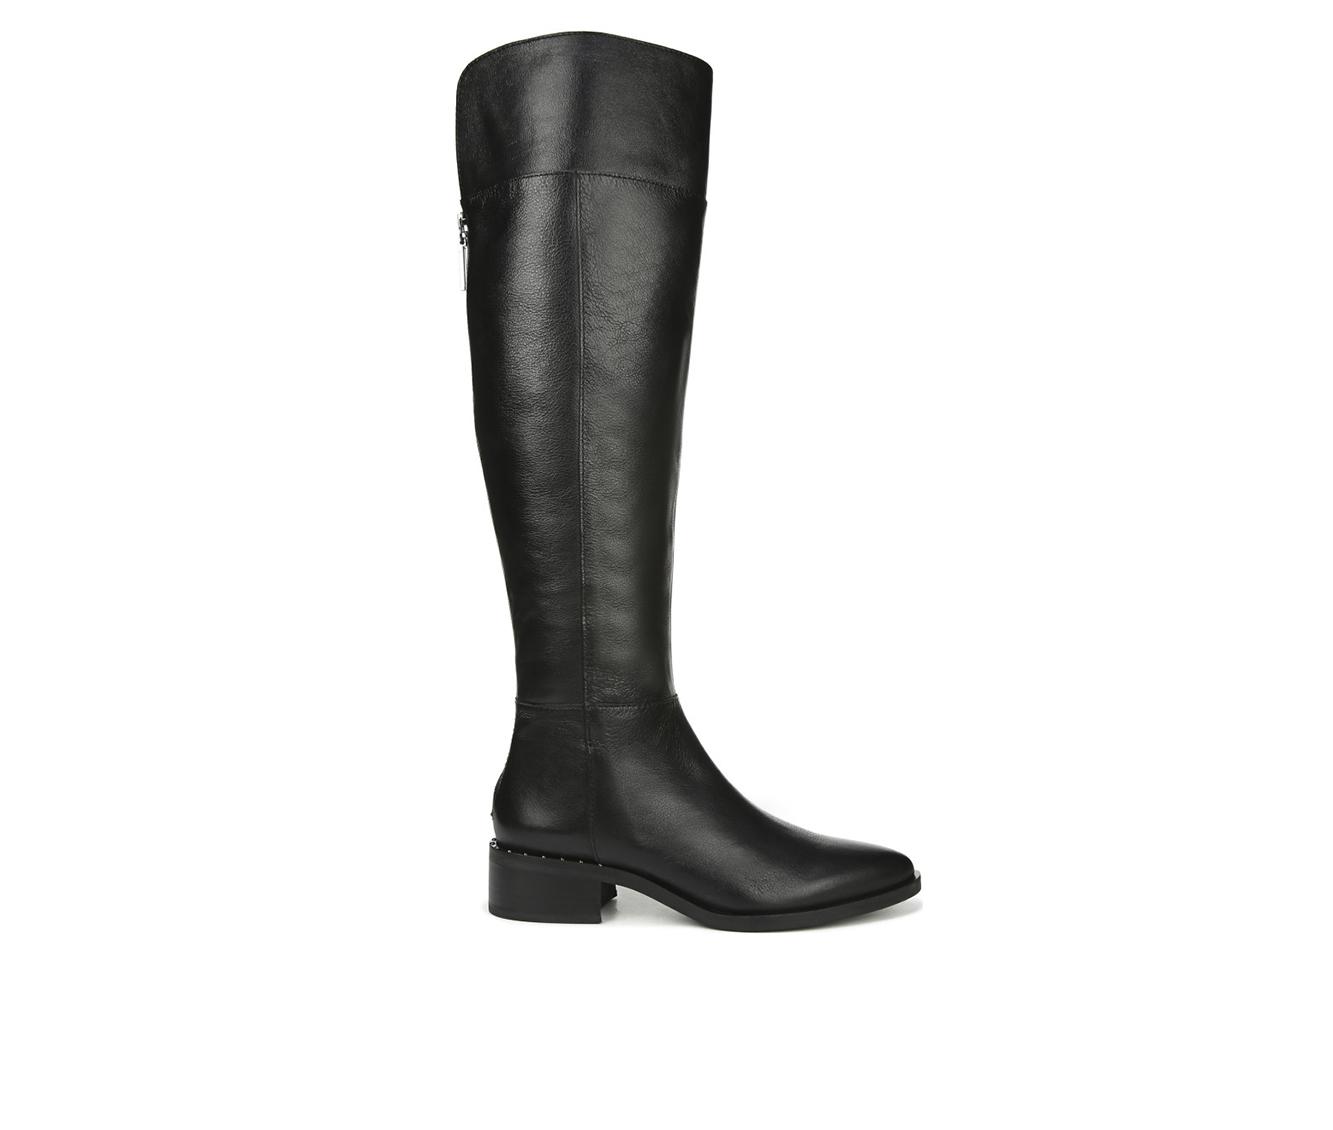 Franco Sarto Daya Women's Boots (Black - Leather)